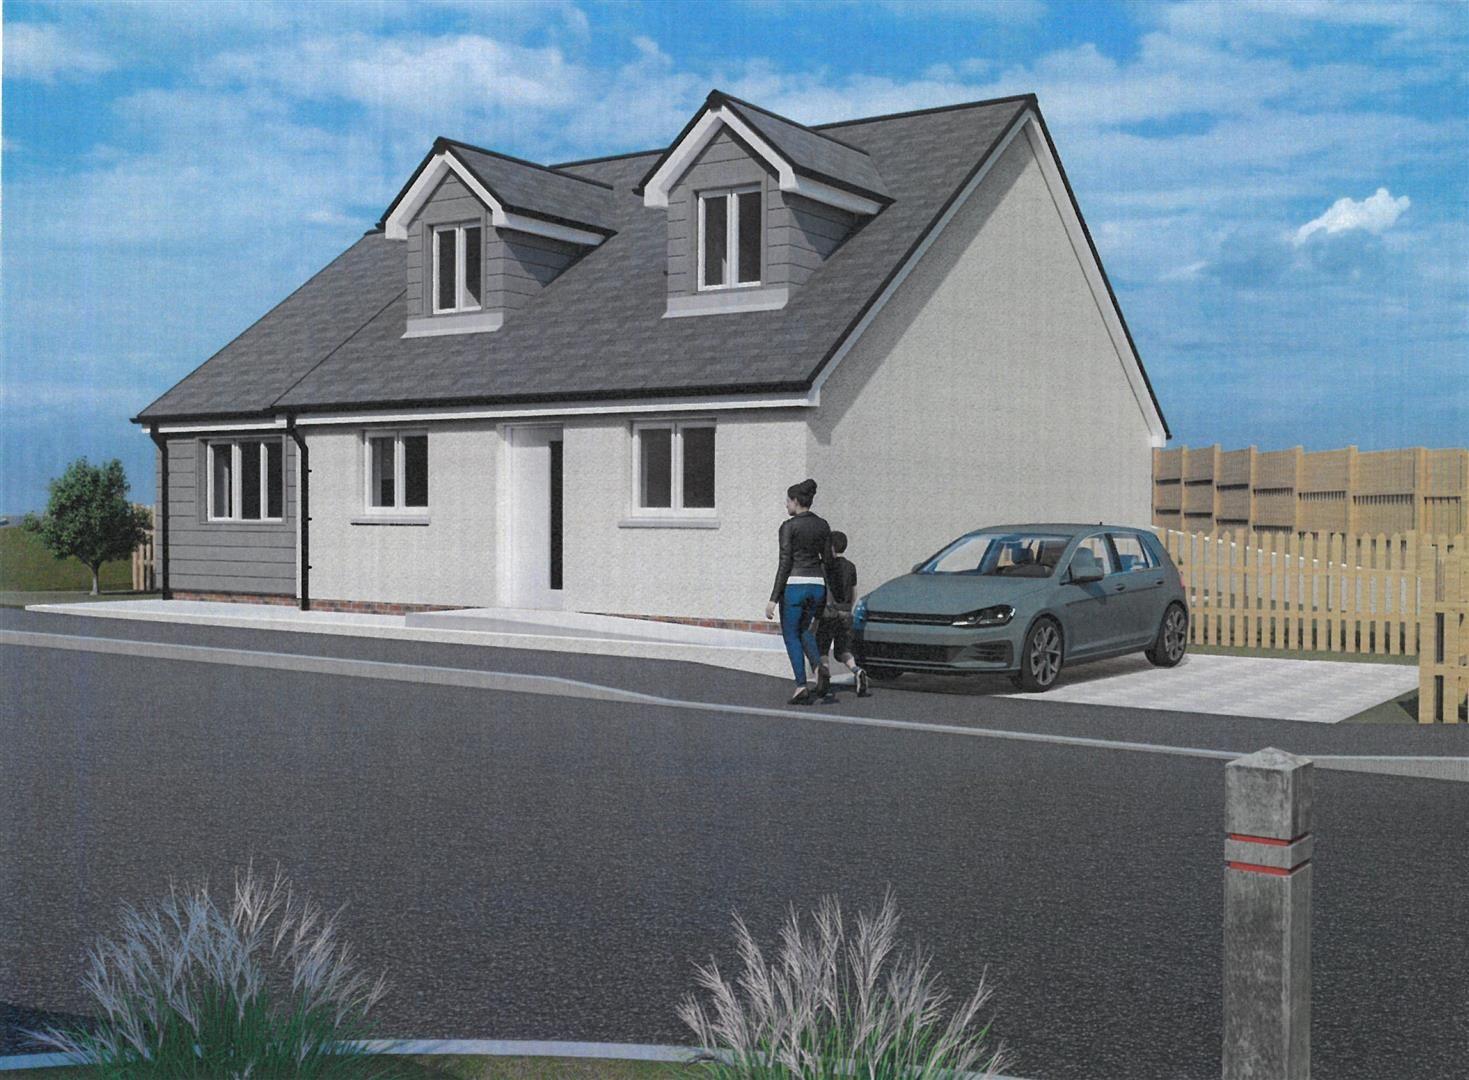 Property photo 1 of 14. S25C-920100716110_0001.Jpg